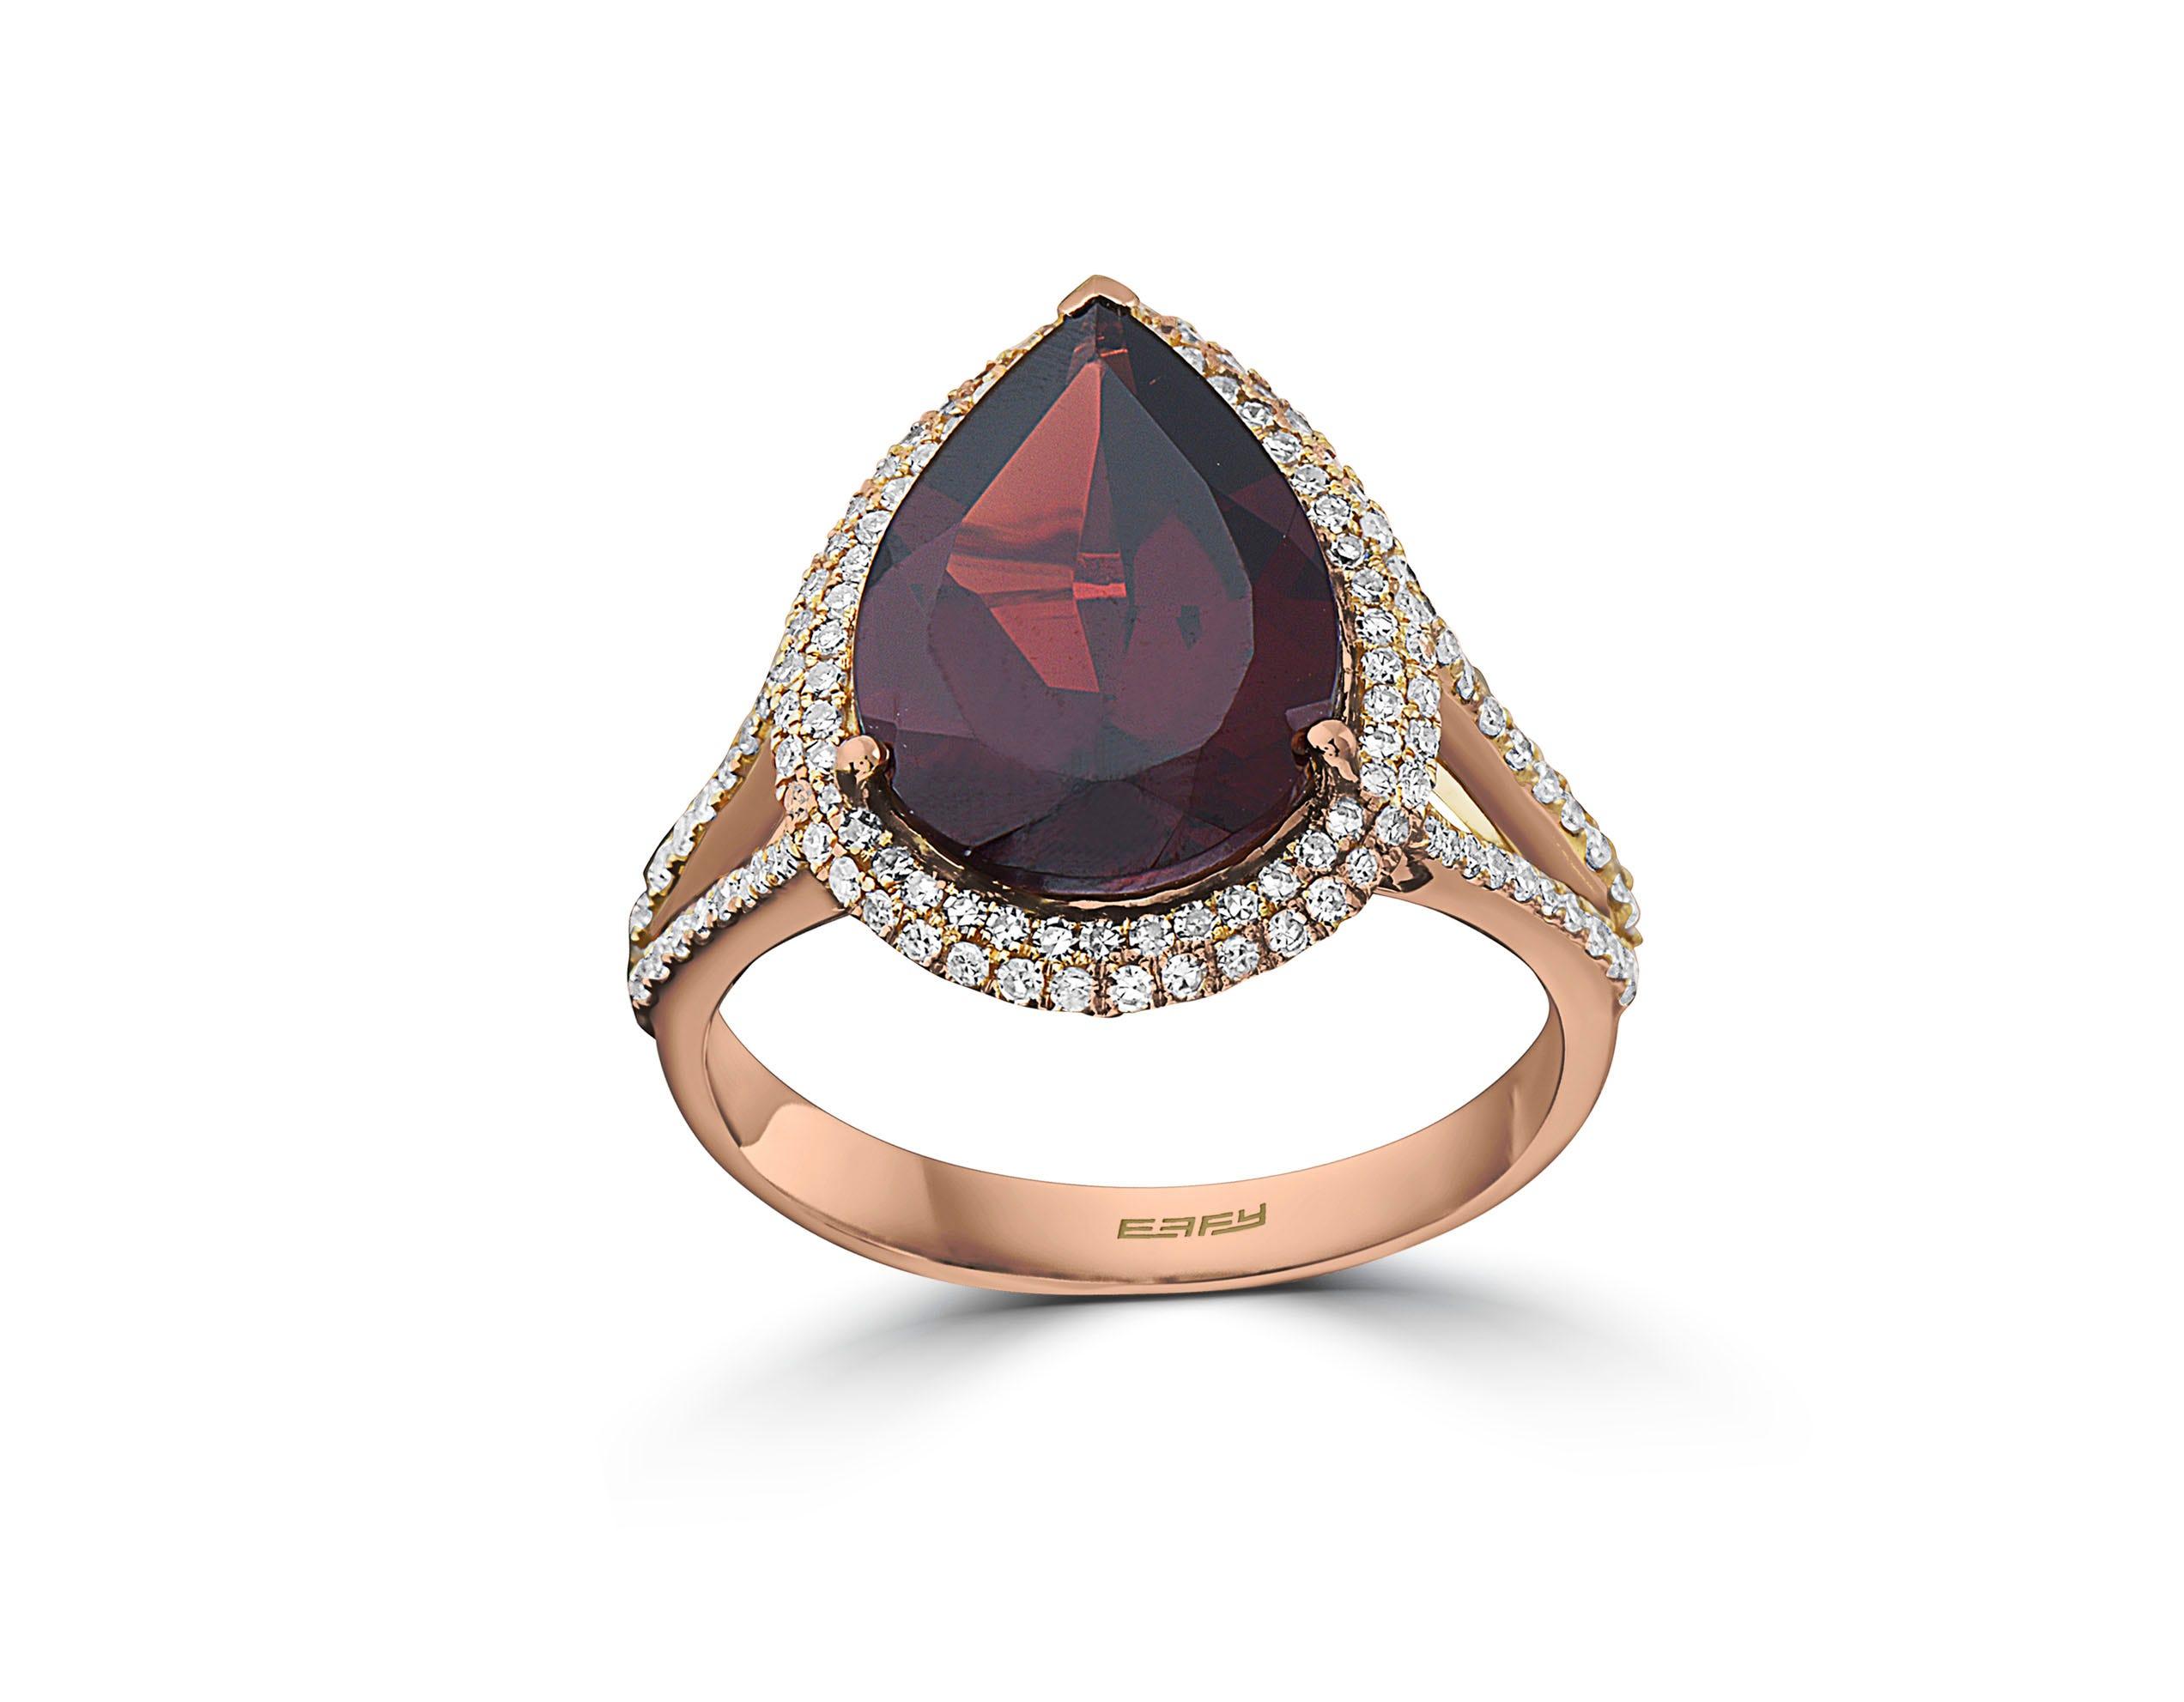 EFFY Pear-Shaped Garnet & Diamond Halo Ring in 14k Rose Gold